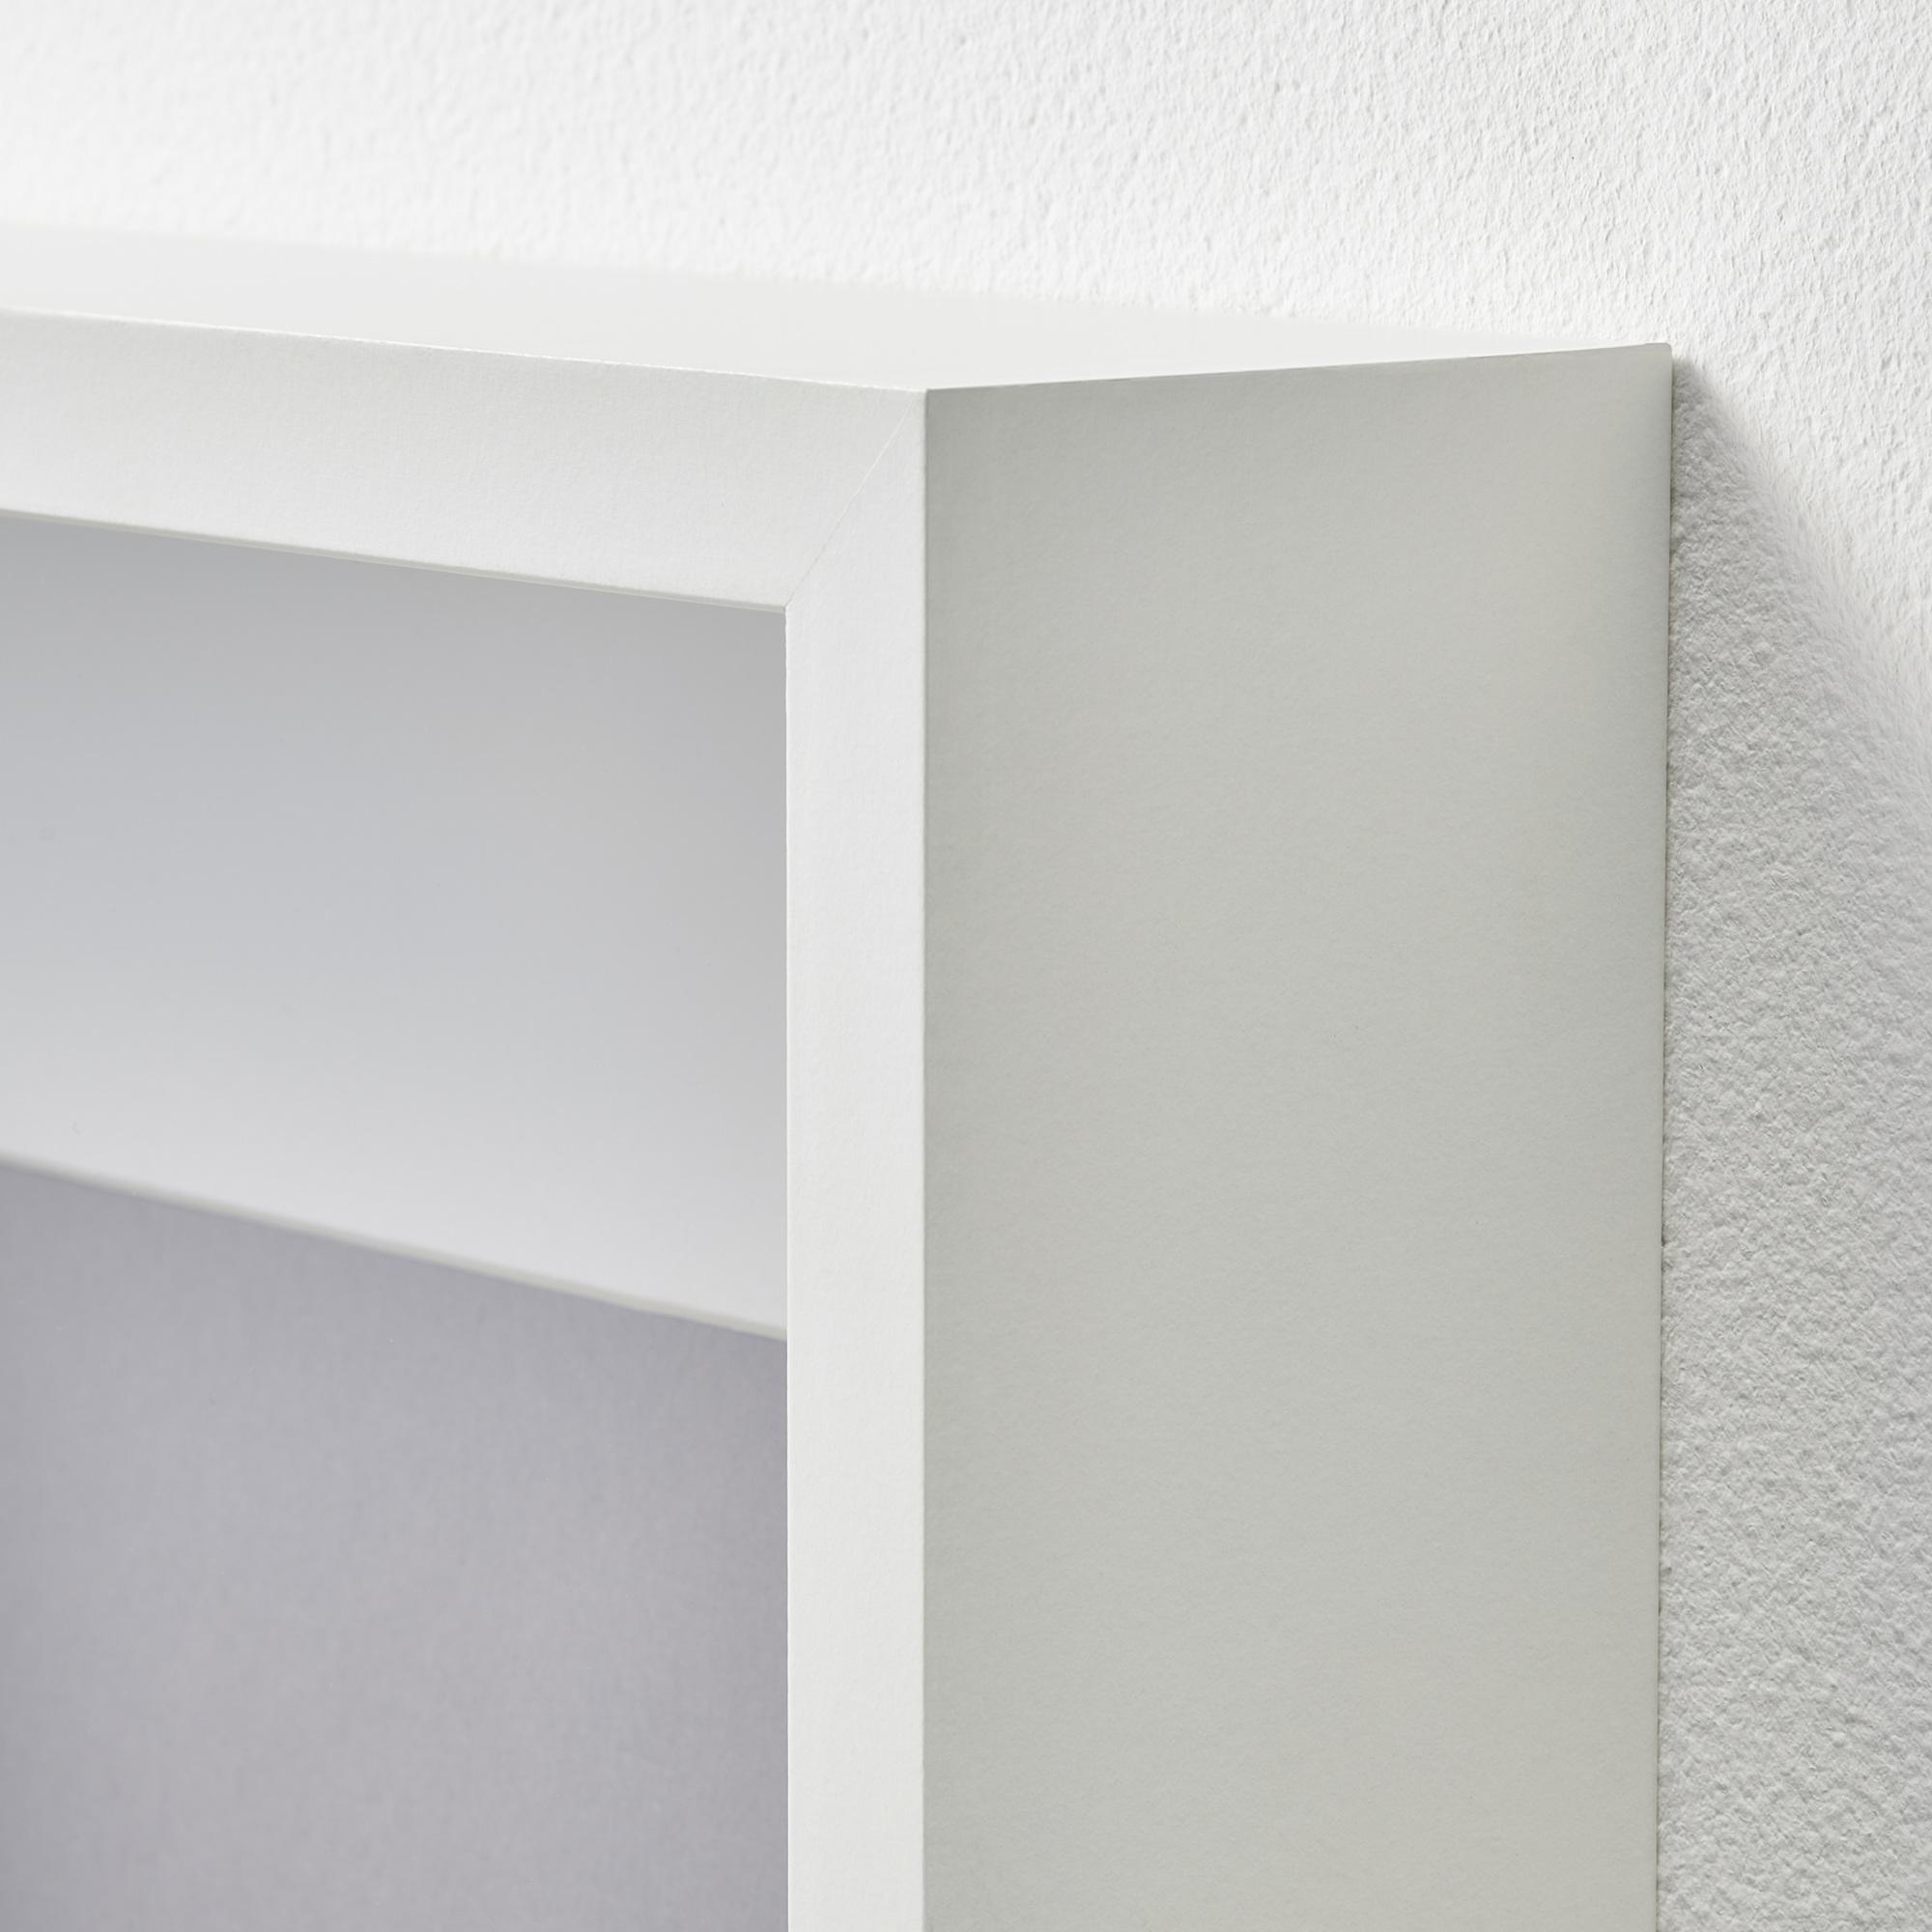 IKEA sannahed Picture Frame Photo Frame White 25x25 cm DEEP Ribba PASSEPARTOUT